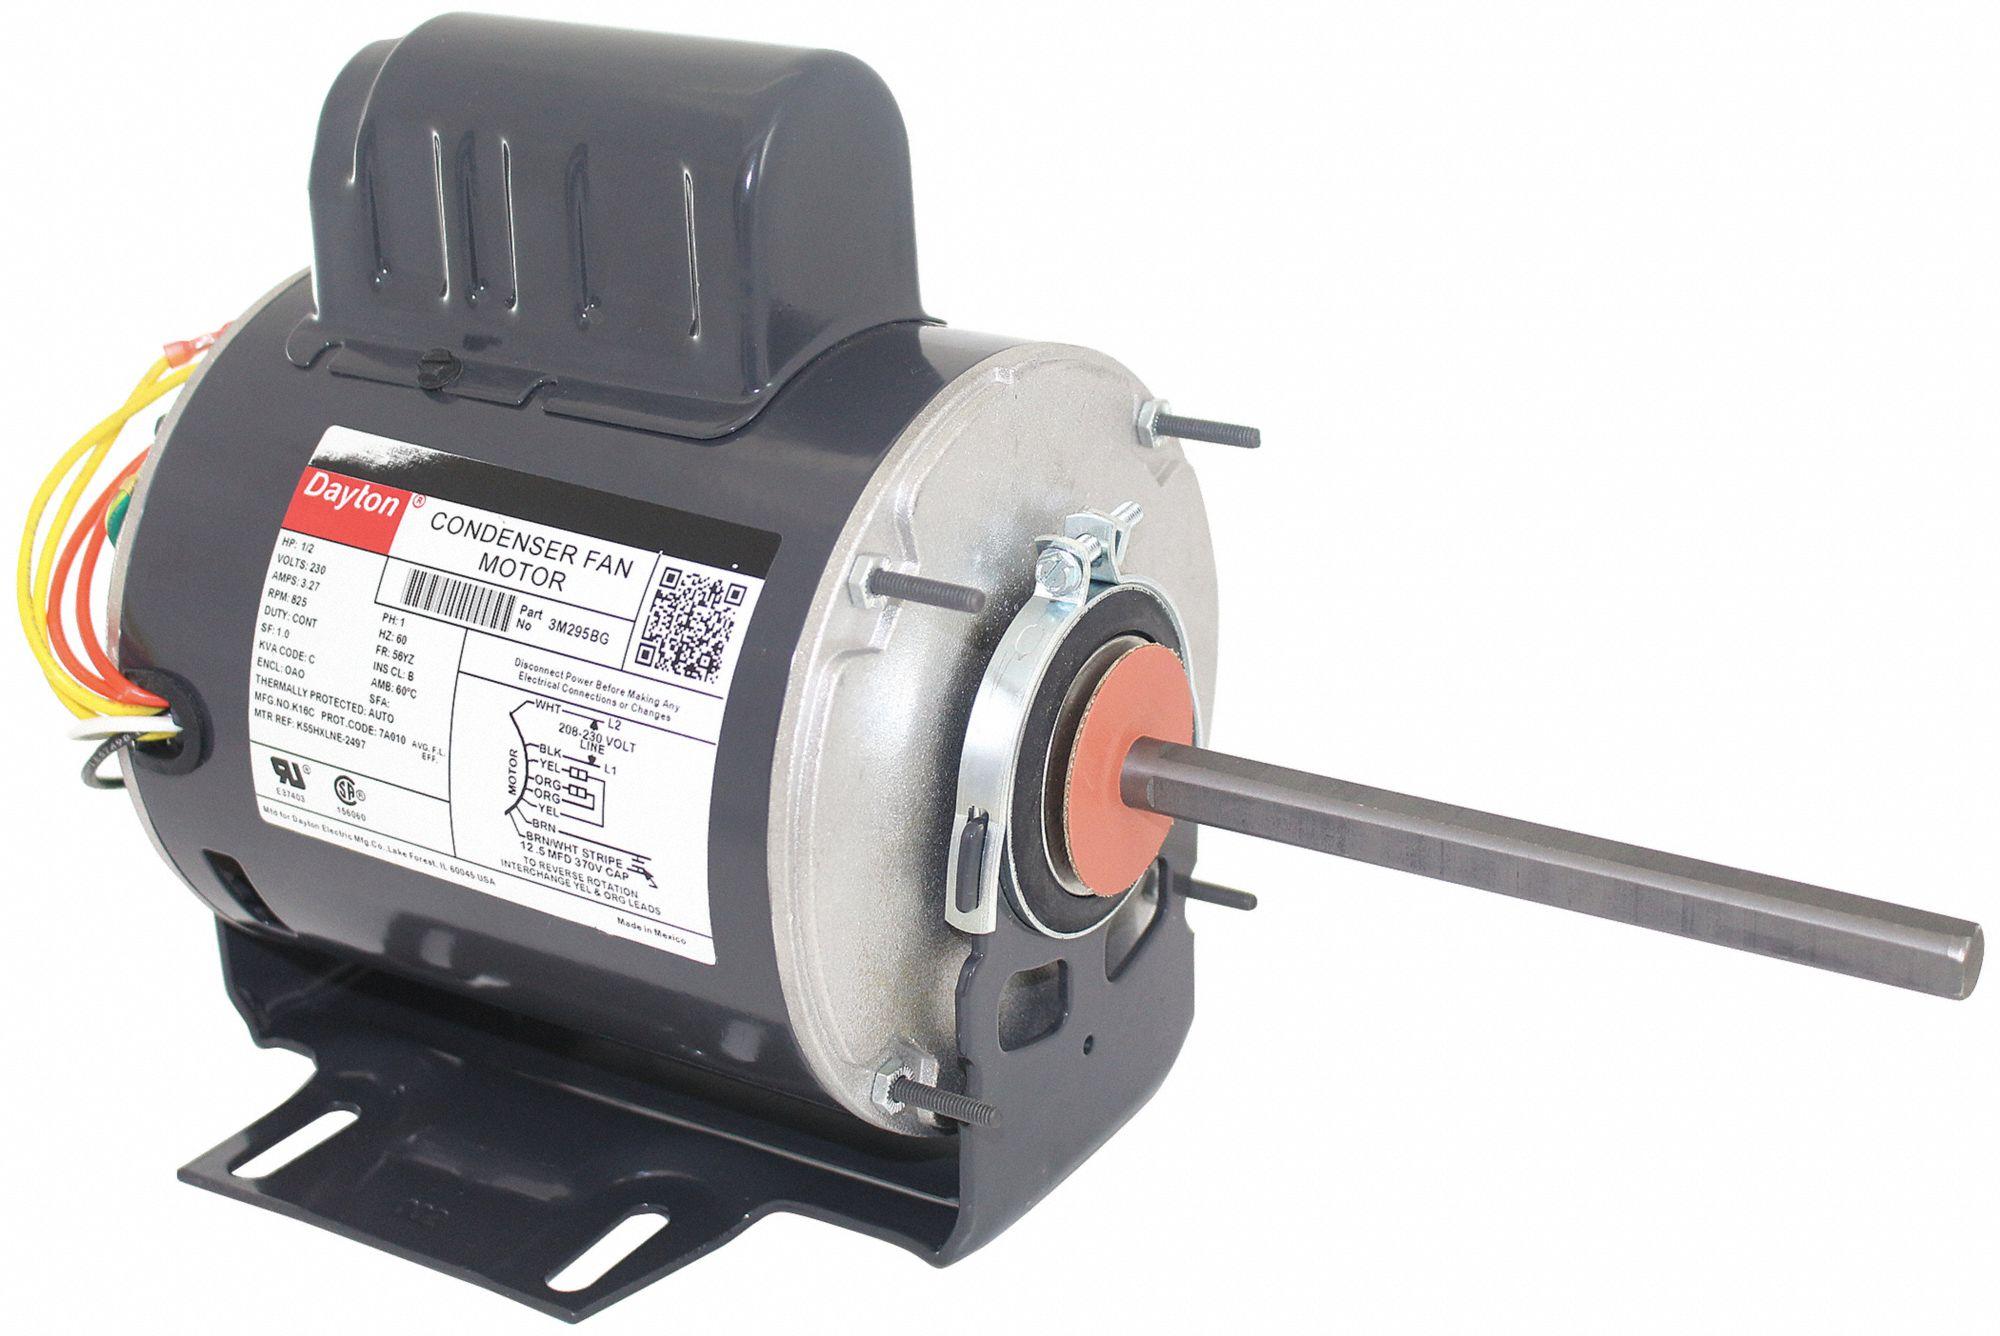 hight resolution of dayton 1 2 hp condenser fan motor permanent split capacitor 825 nameplate rpm 230 voltage frame 56yz 3m295 3m295 grainger